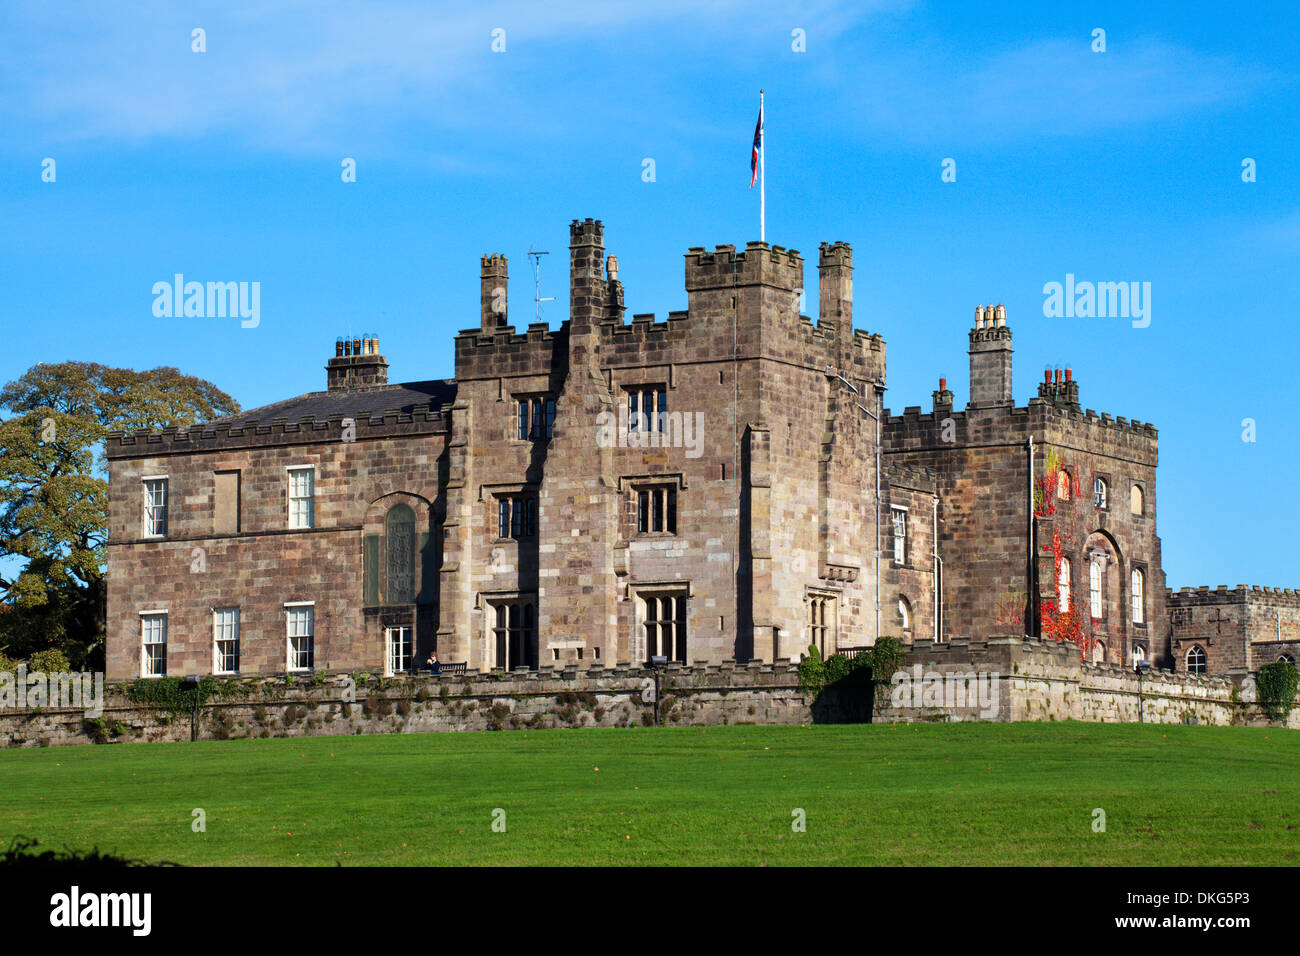 Ripley Castle, Ripley, Yorkshire du Nord, Yorkshire, Angleterre, Royaume-Uni, Europe Photo Stock